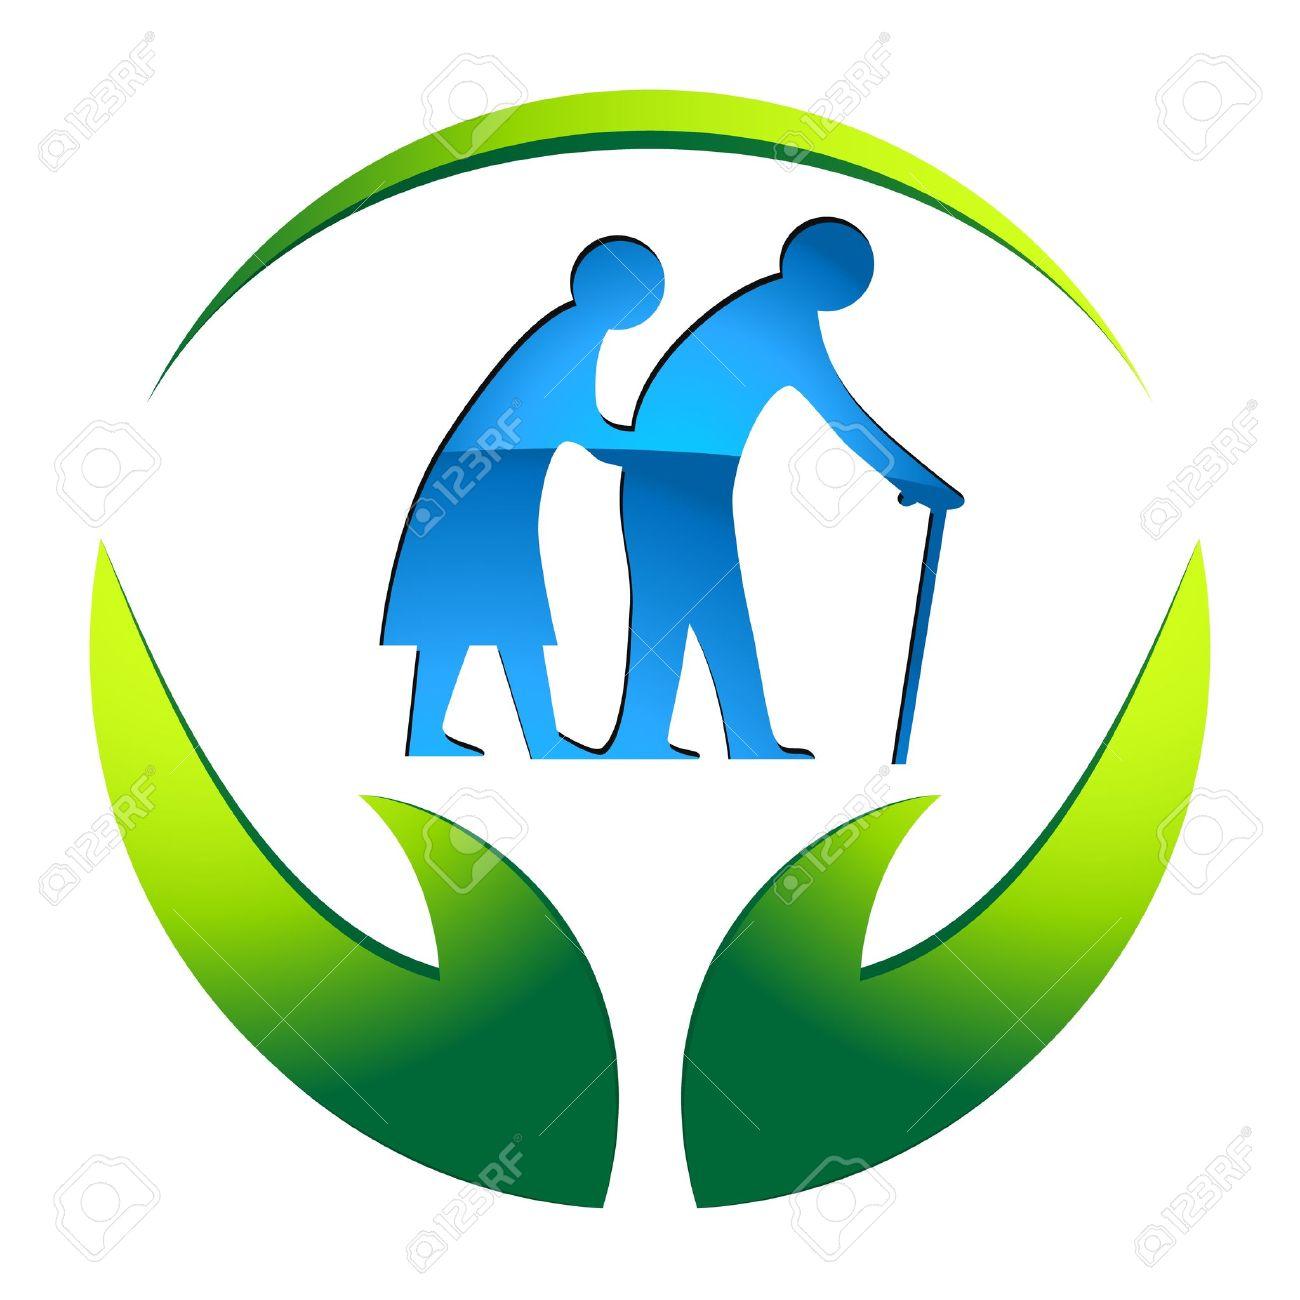 nursing home sign - 22025757